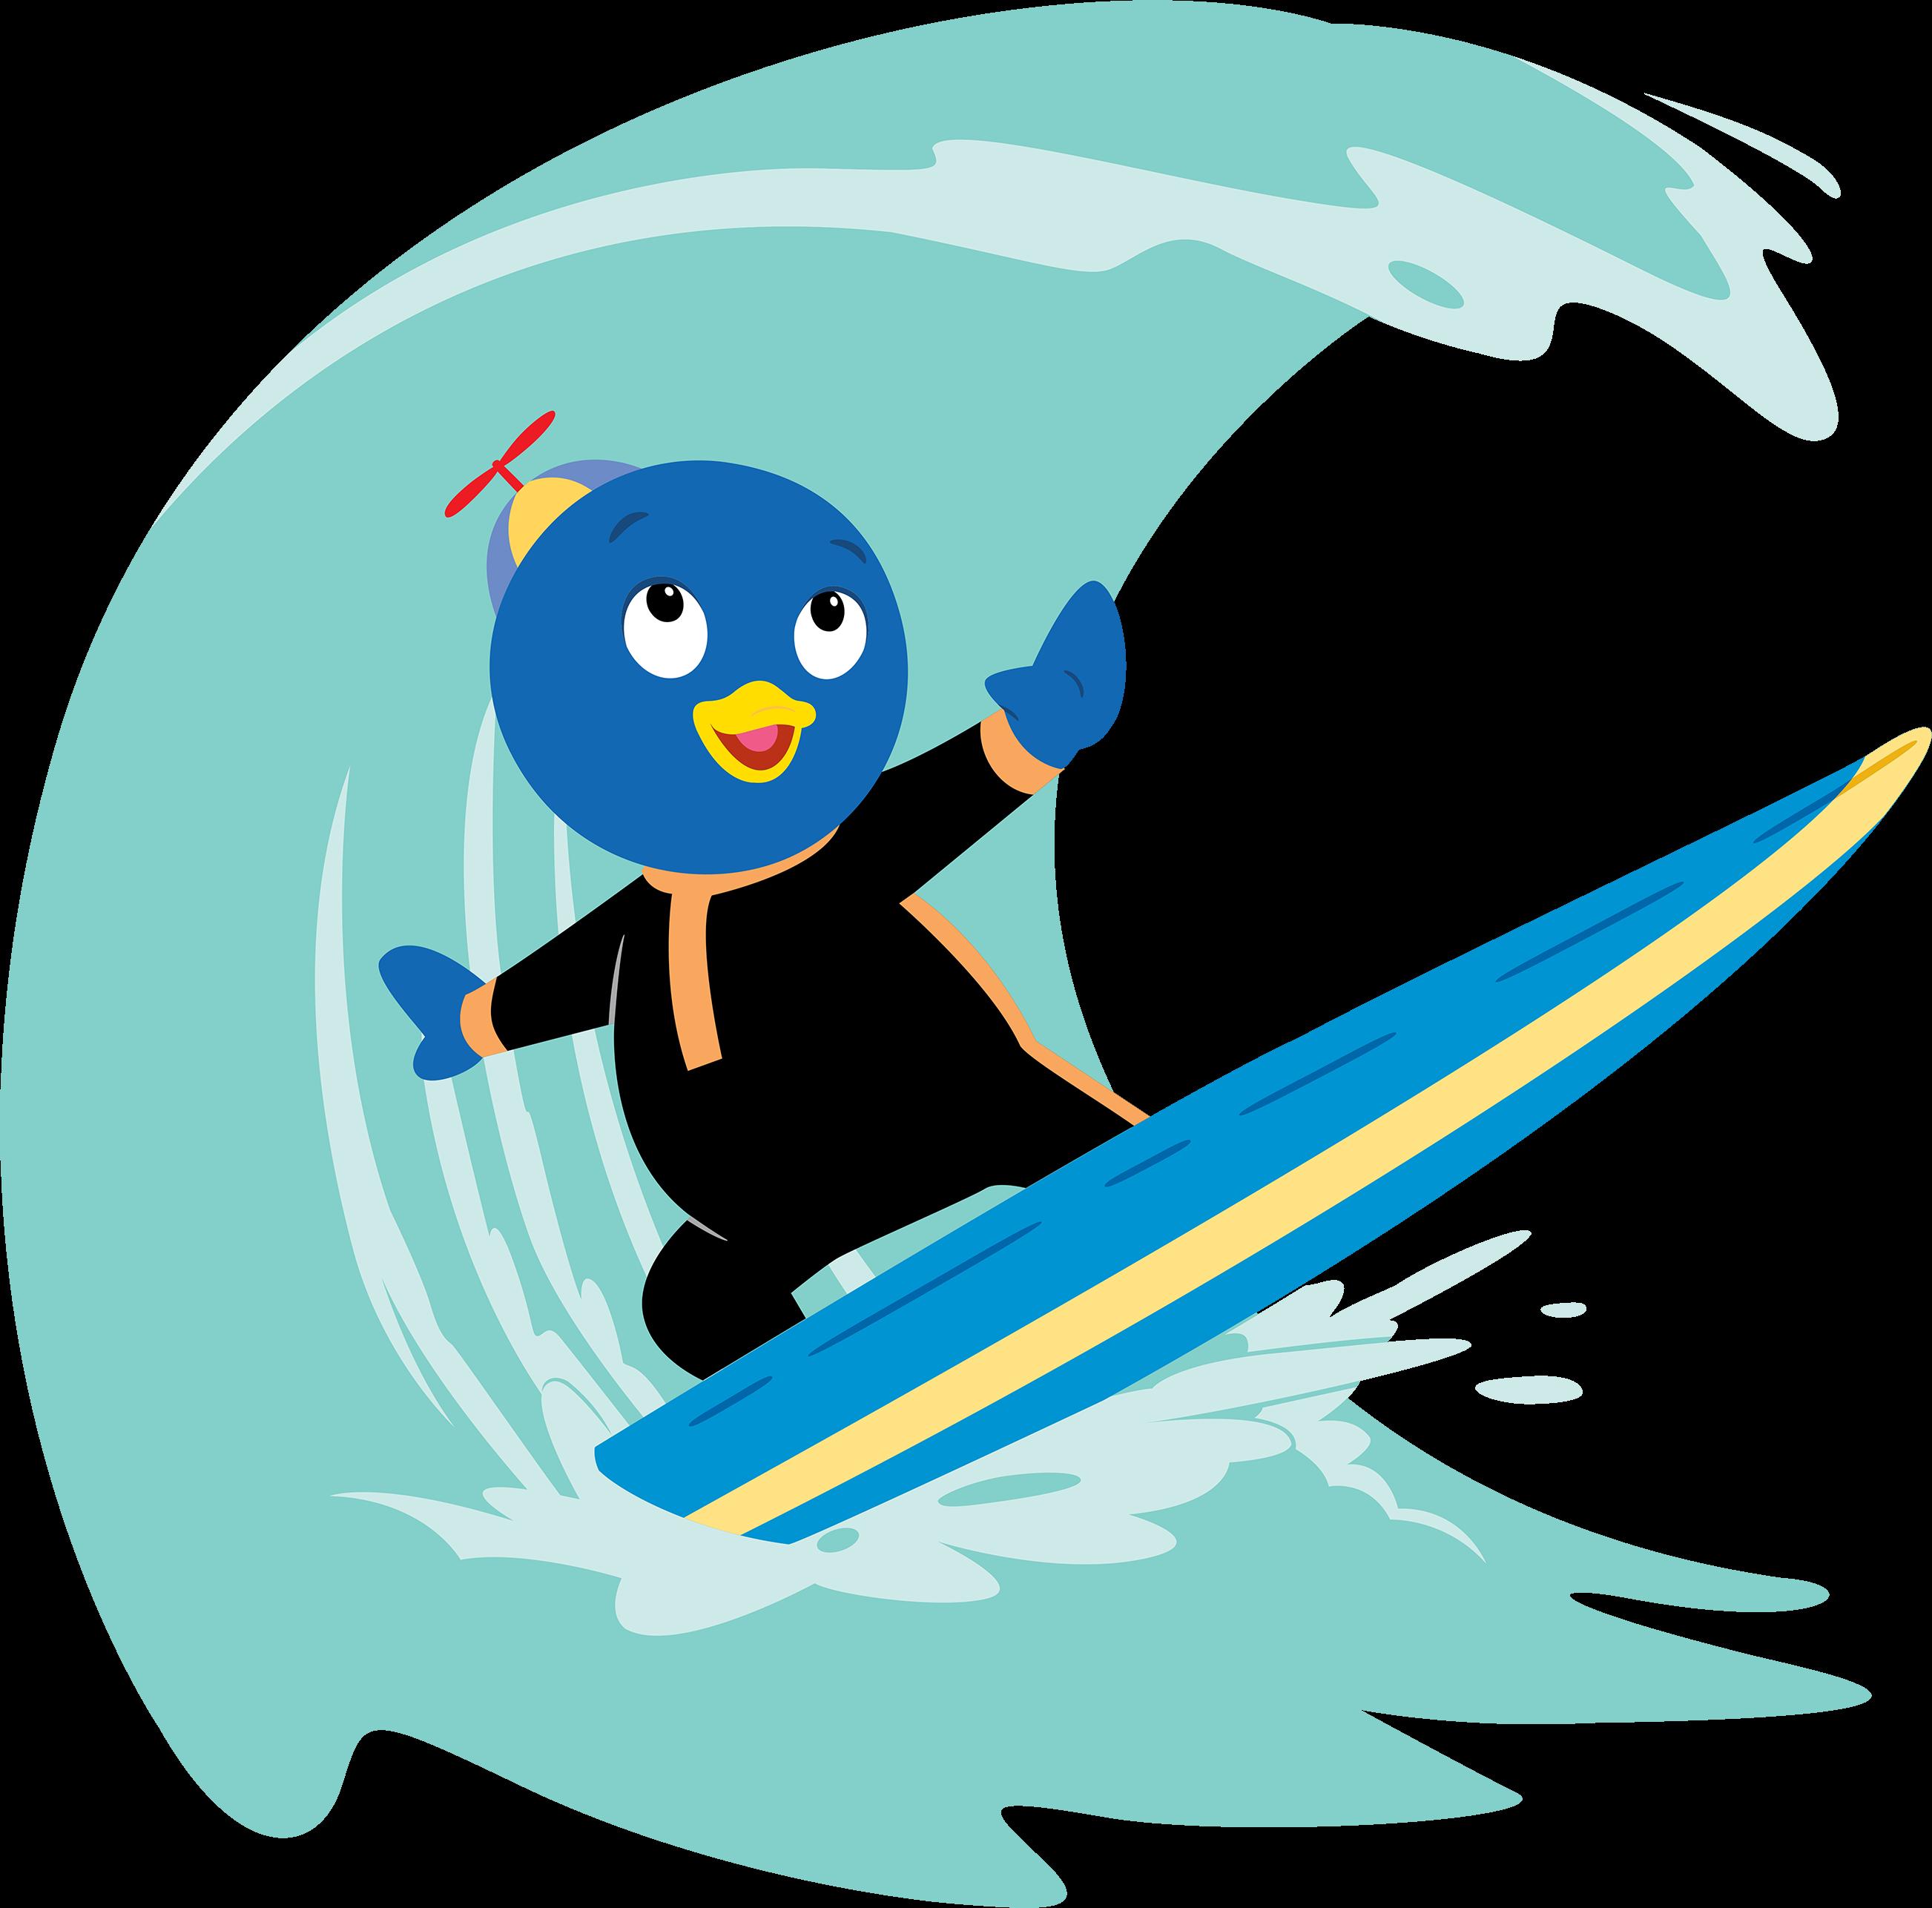 Surfing clipart beach theme. Image the backyardigans bonanza